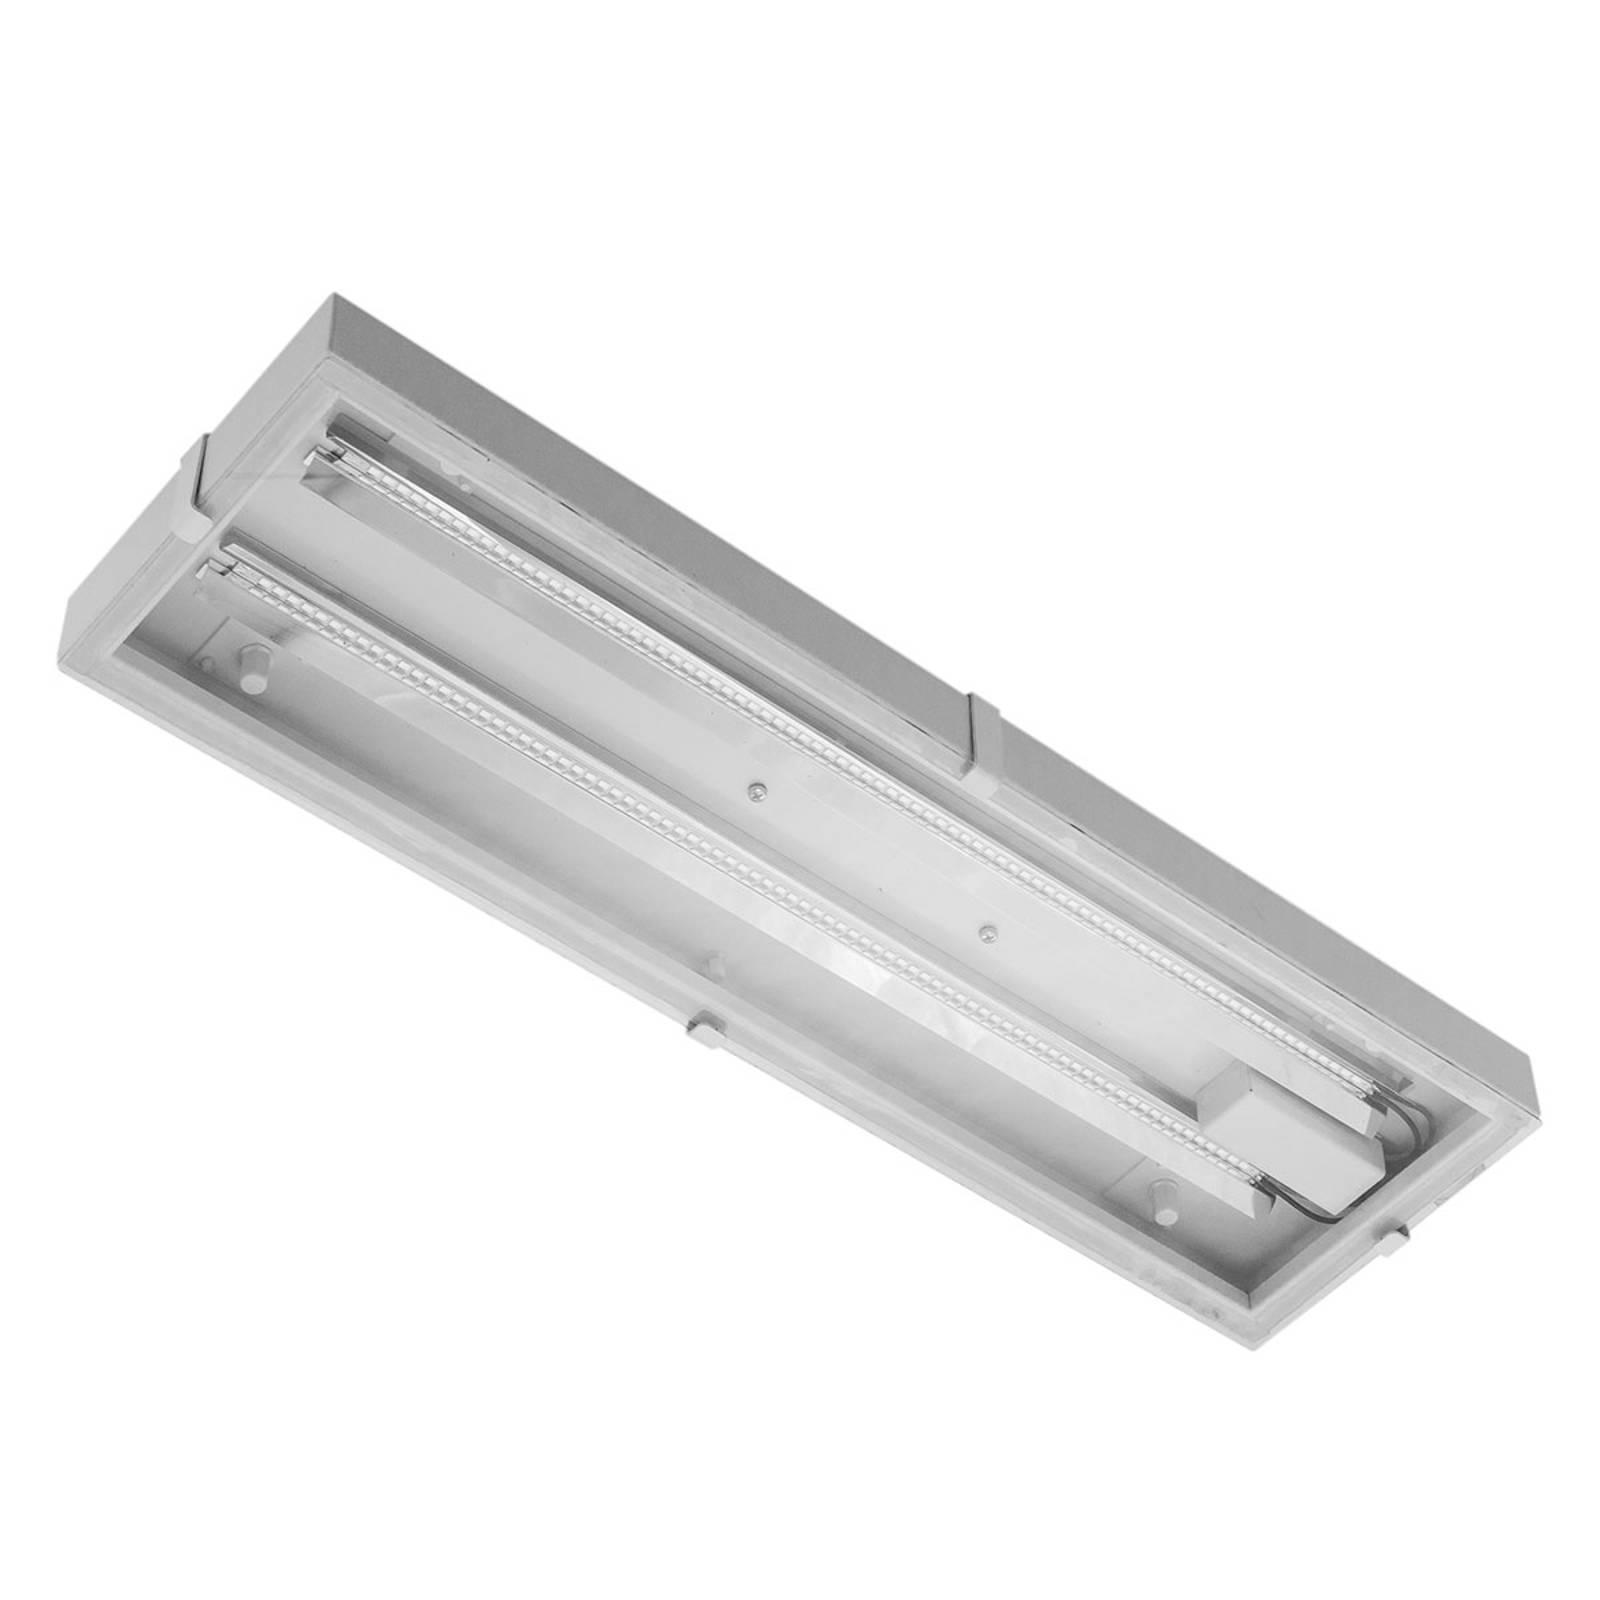 LED-hallivalaisin Narrow Beam lasikupu 56 W